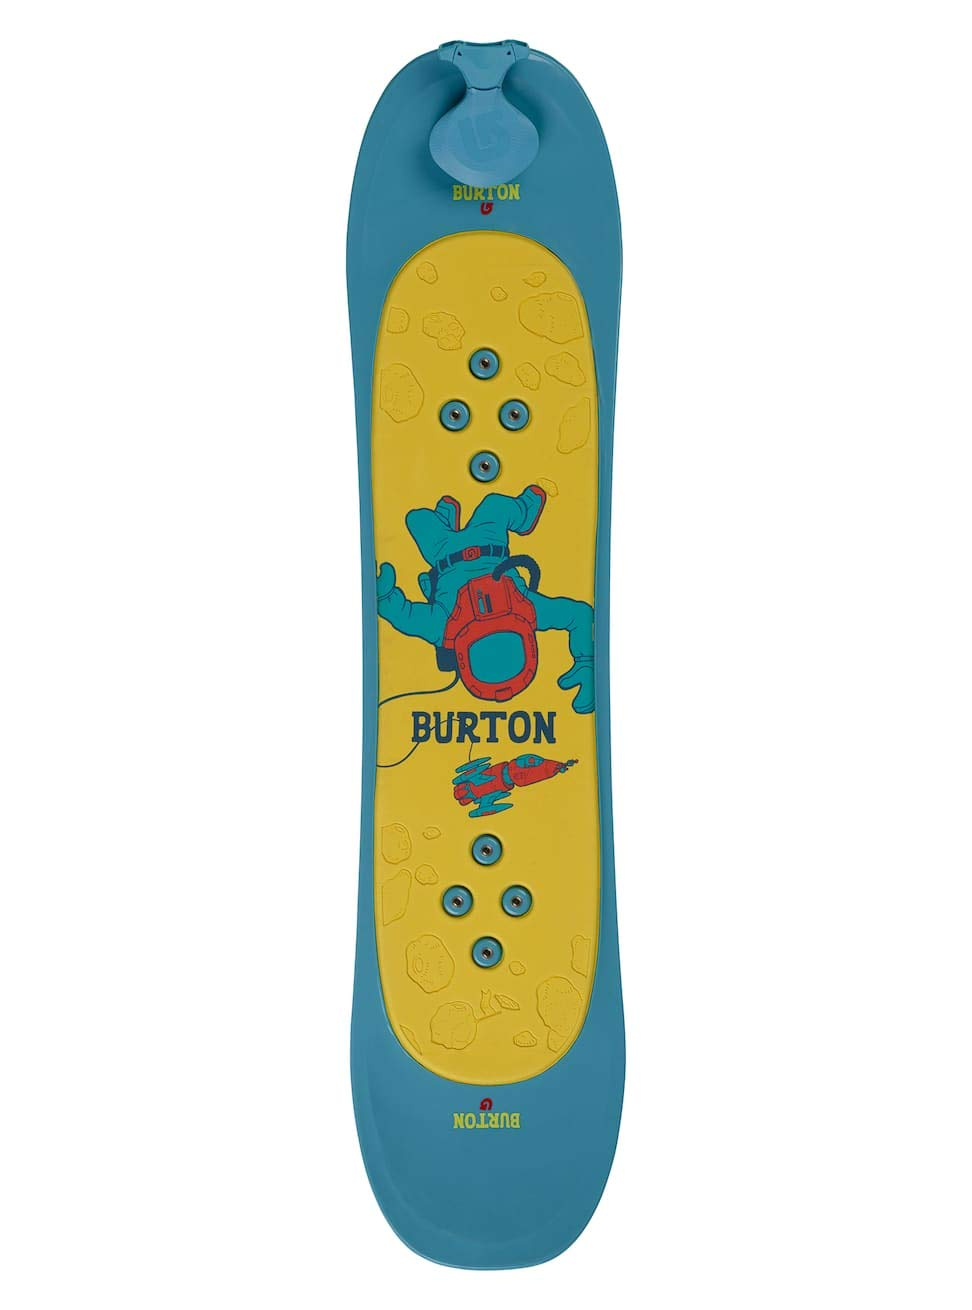 d0deac7e Burton Child's Riglet Snowboard: Amazon.co.uk: Sports & Outdoors